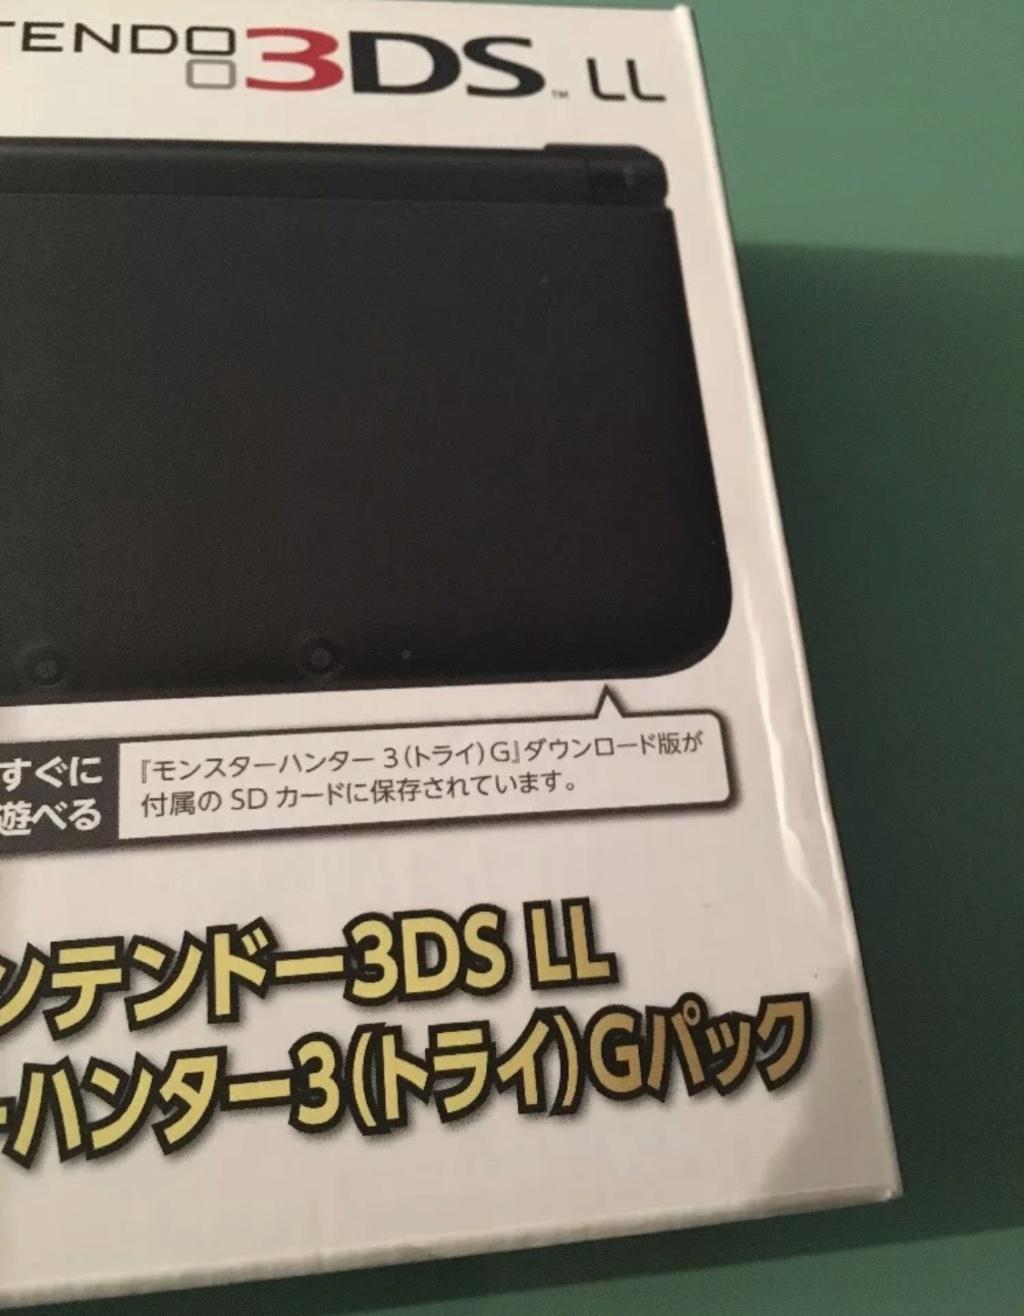 Vds 40 jeux GB en boite / 3dsxl,GBs en boite - Page 2 B3ca1b10